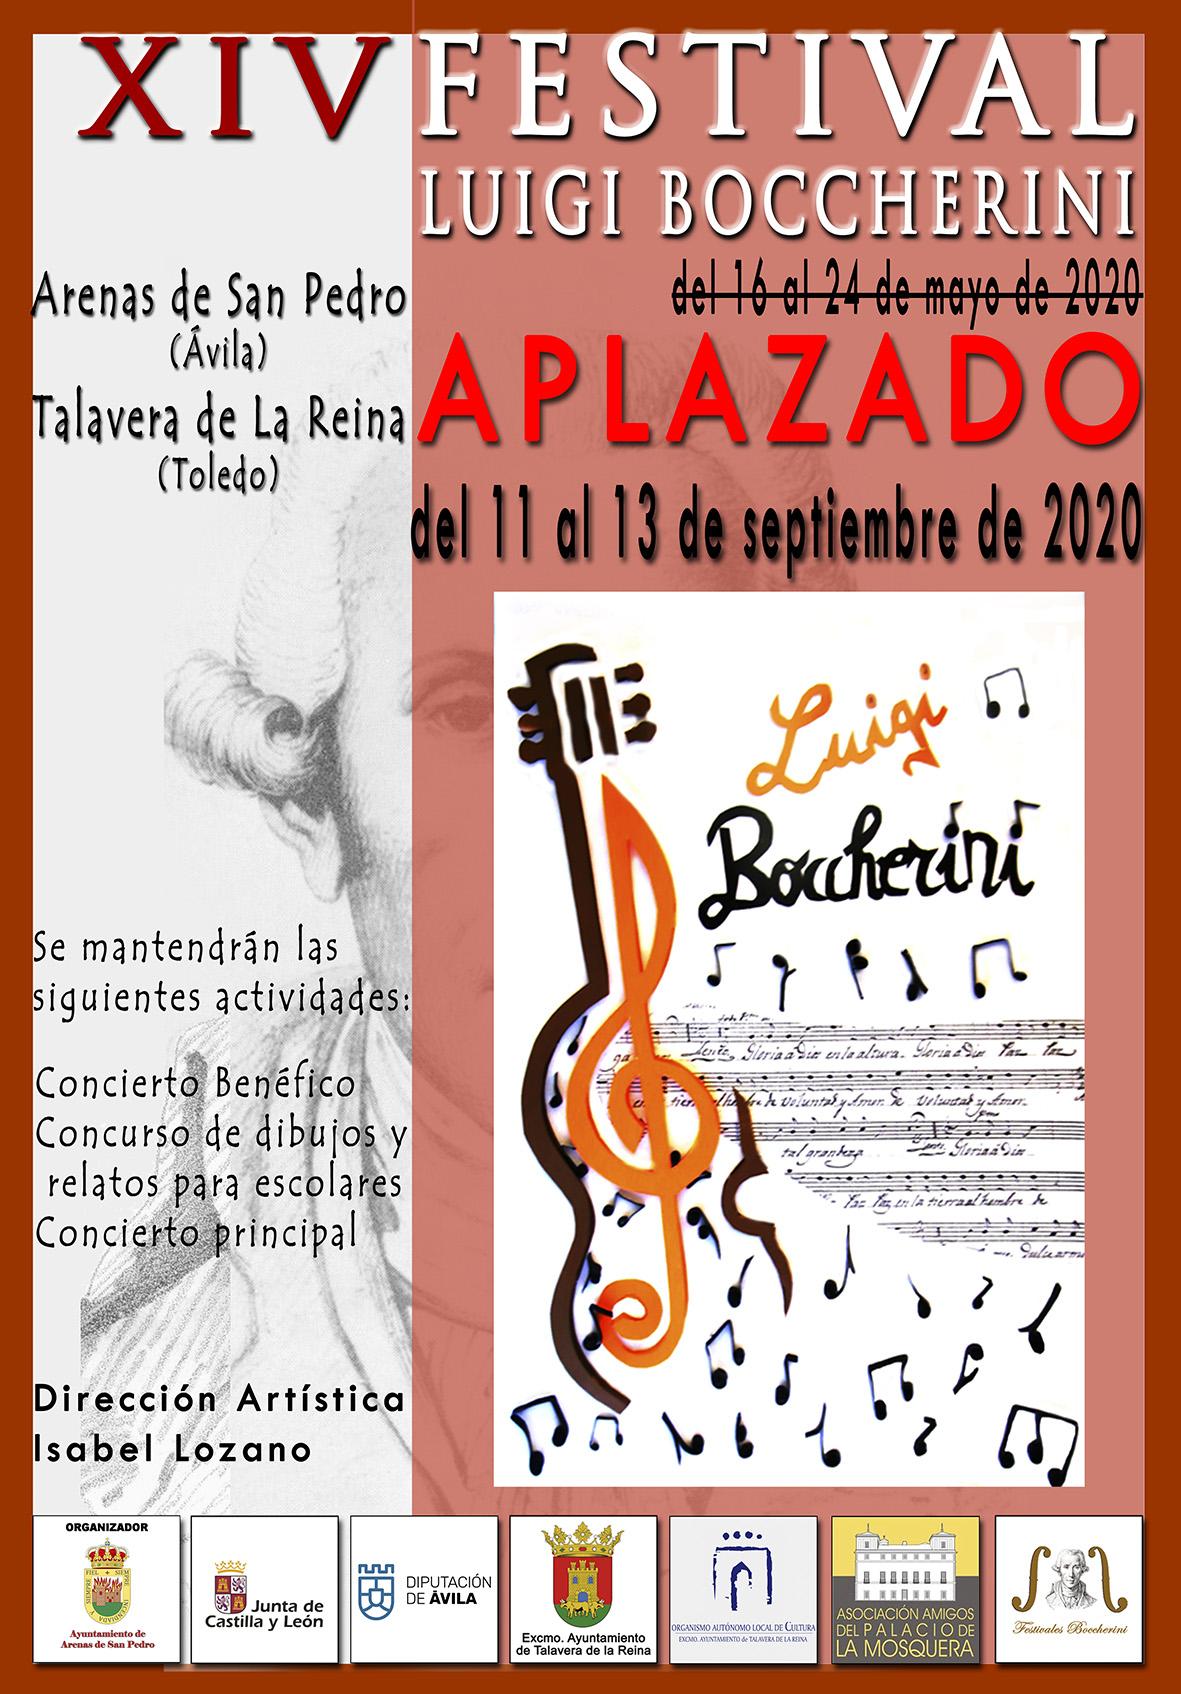 XIV Festival Boccherini 2020 APLAZADO - TiétarTeVe